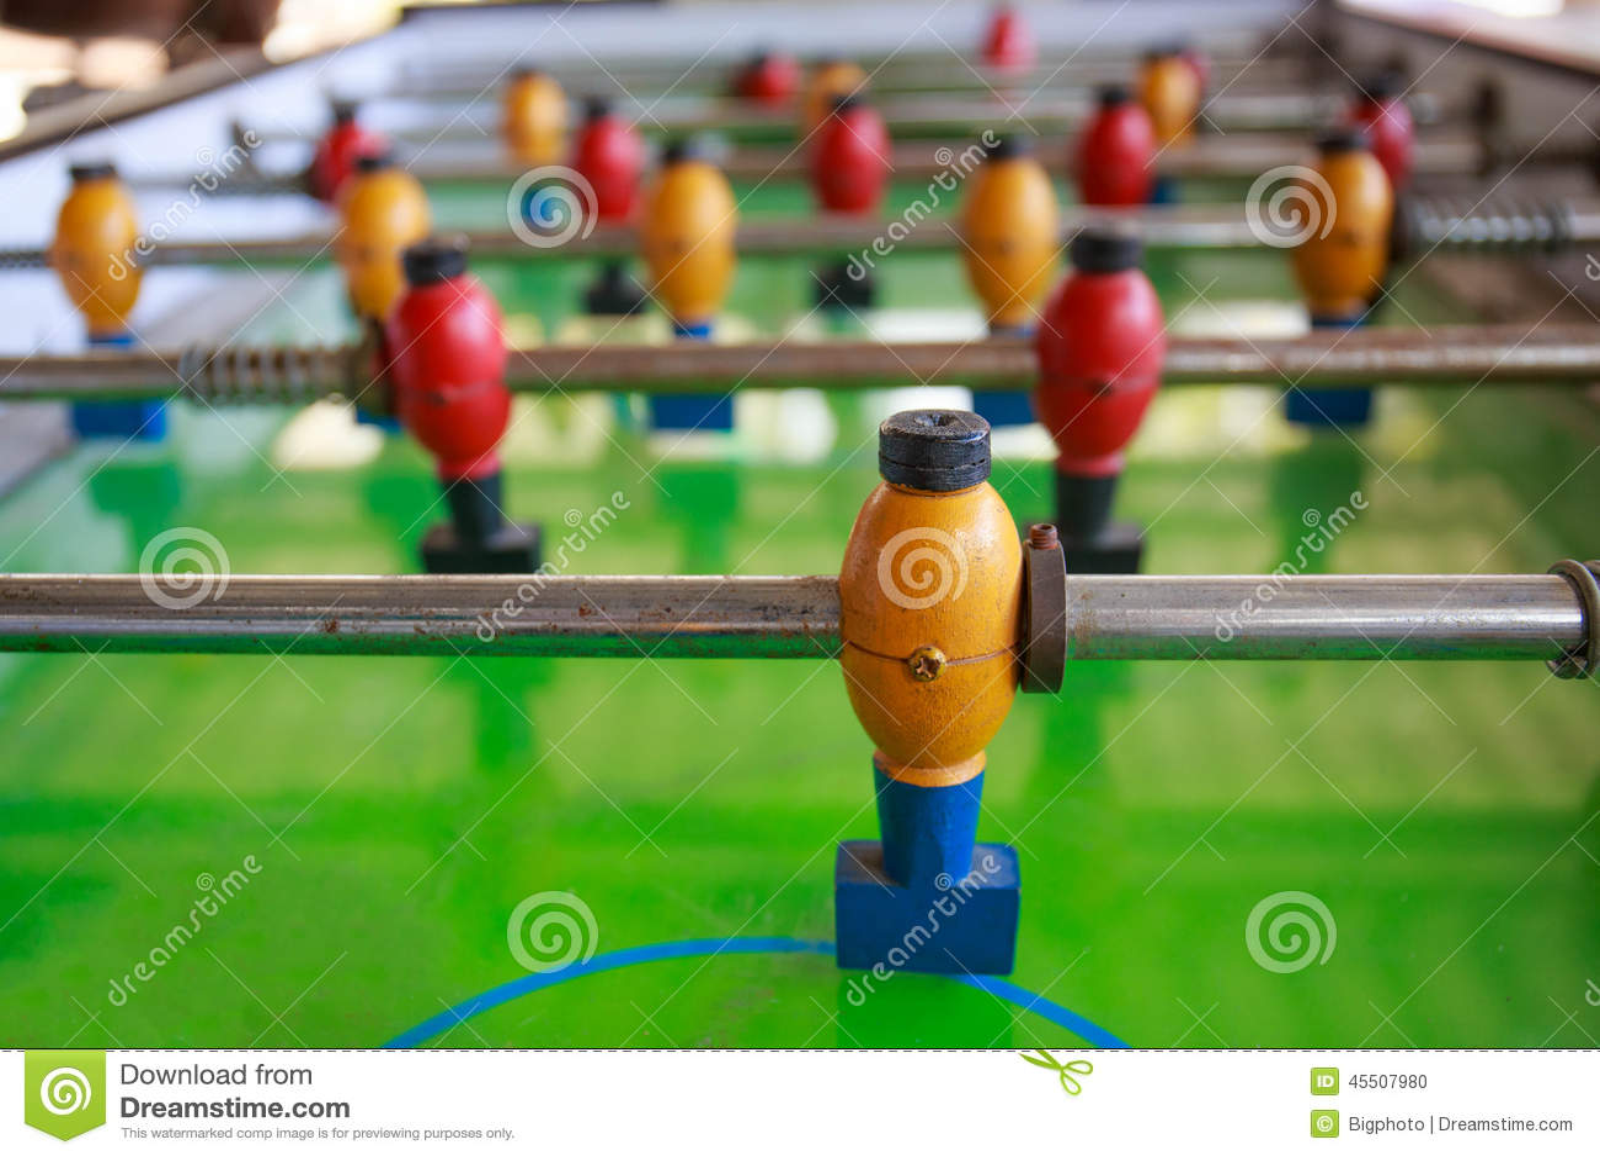 Old football table, soccer table